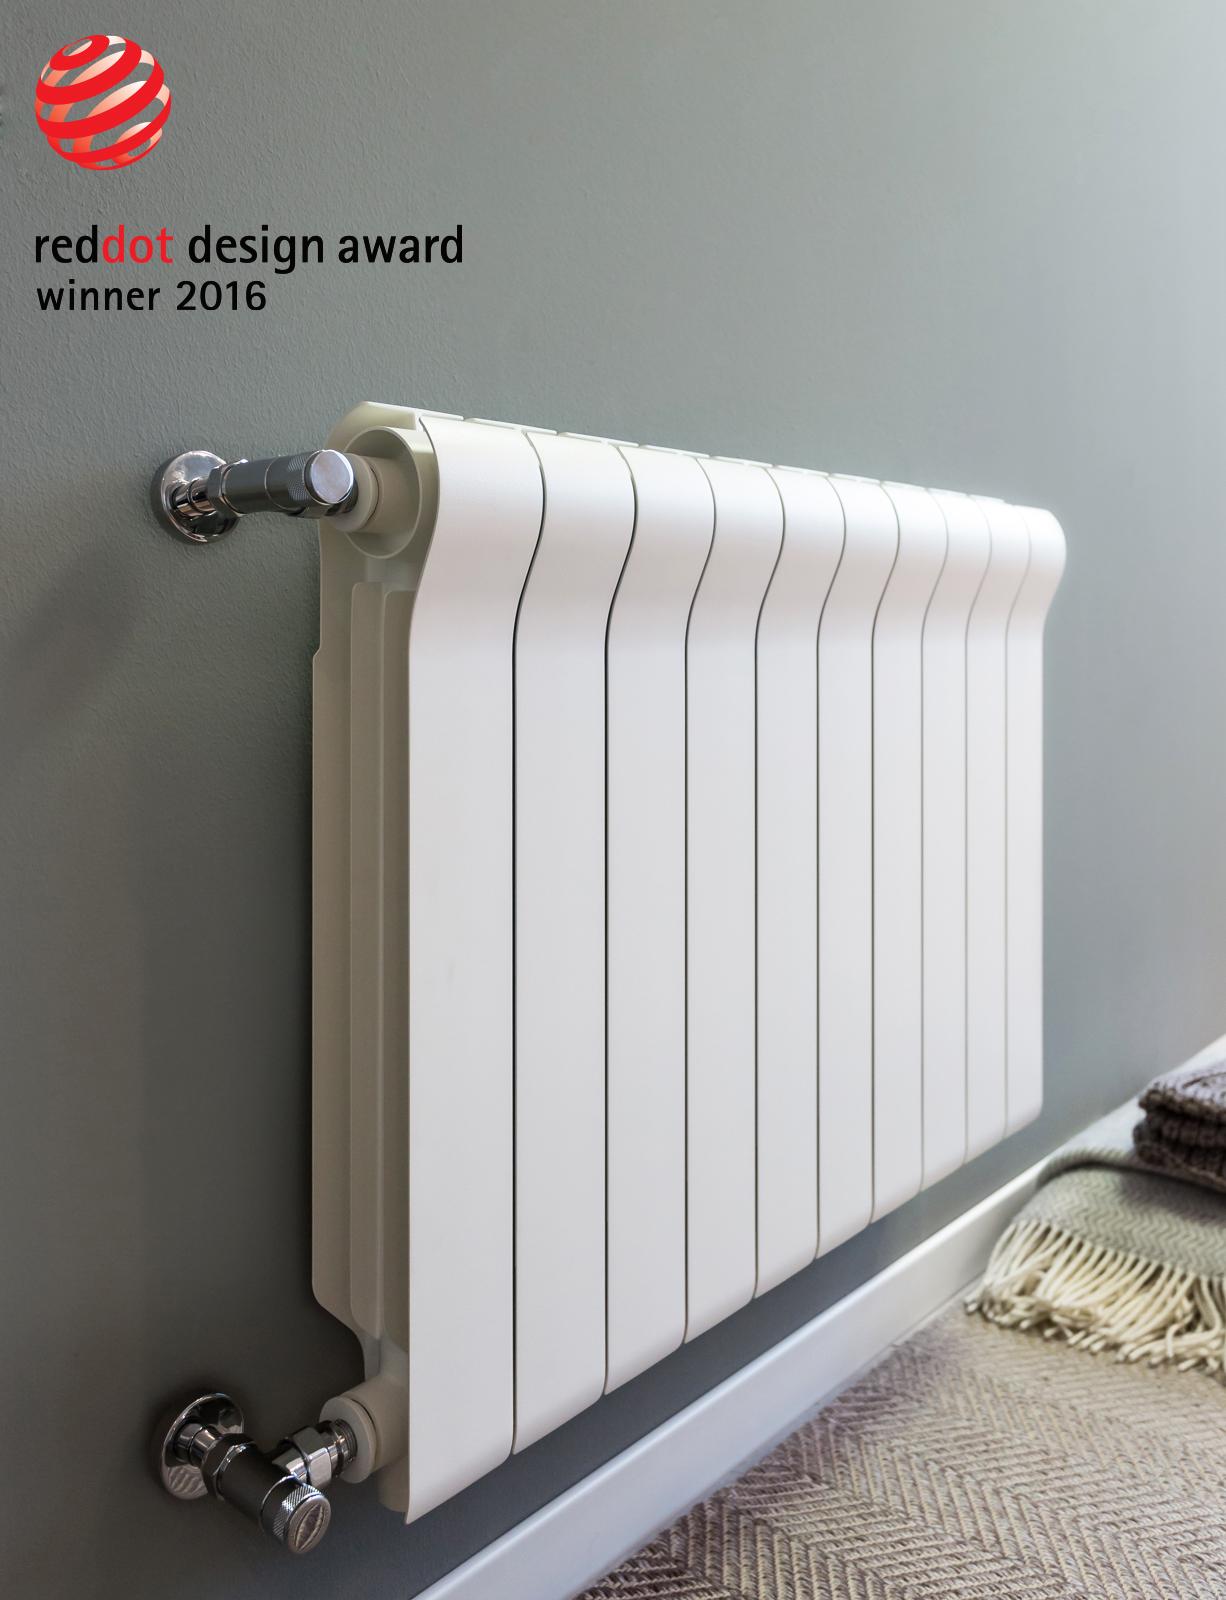 red dot design award - photo #27